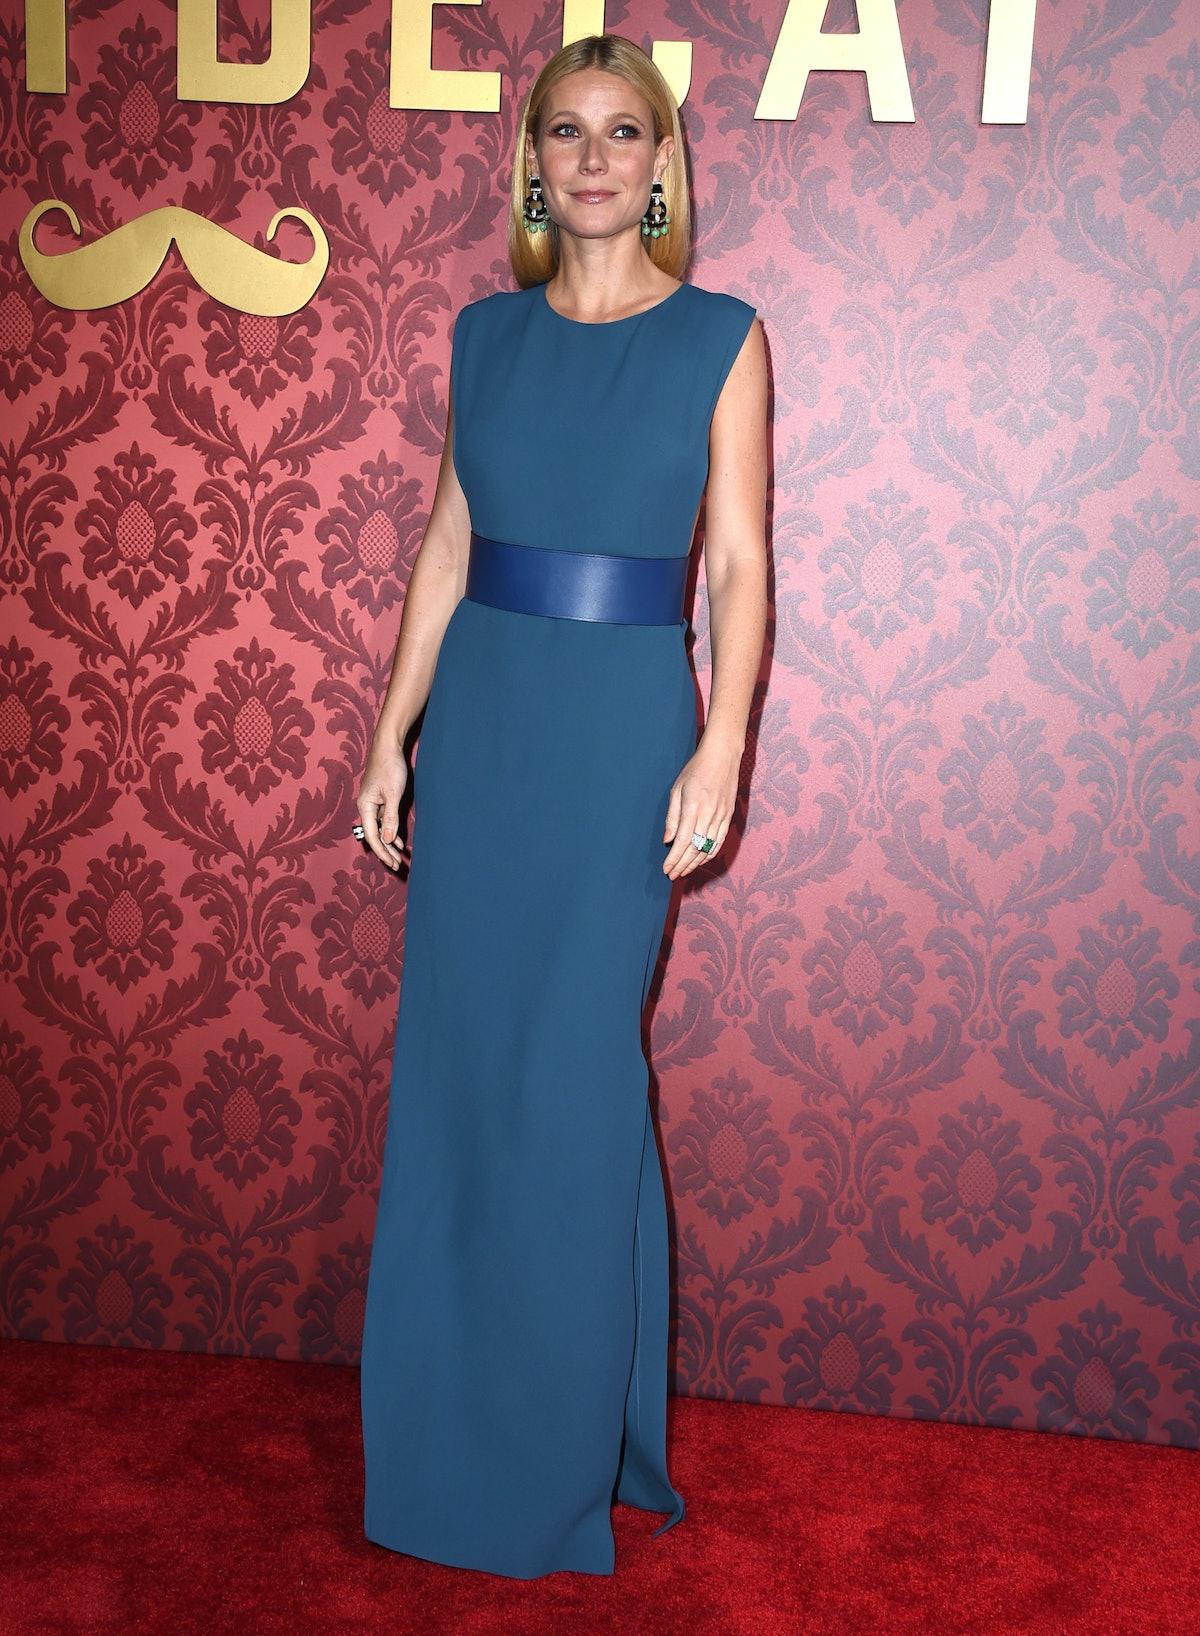 Gwyneth Paltrow in blue Lanvin gown.